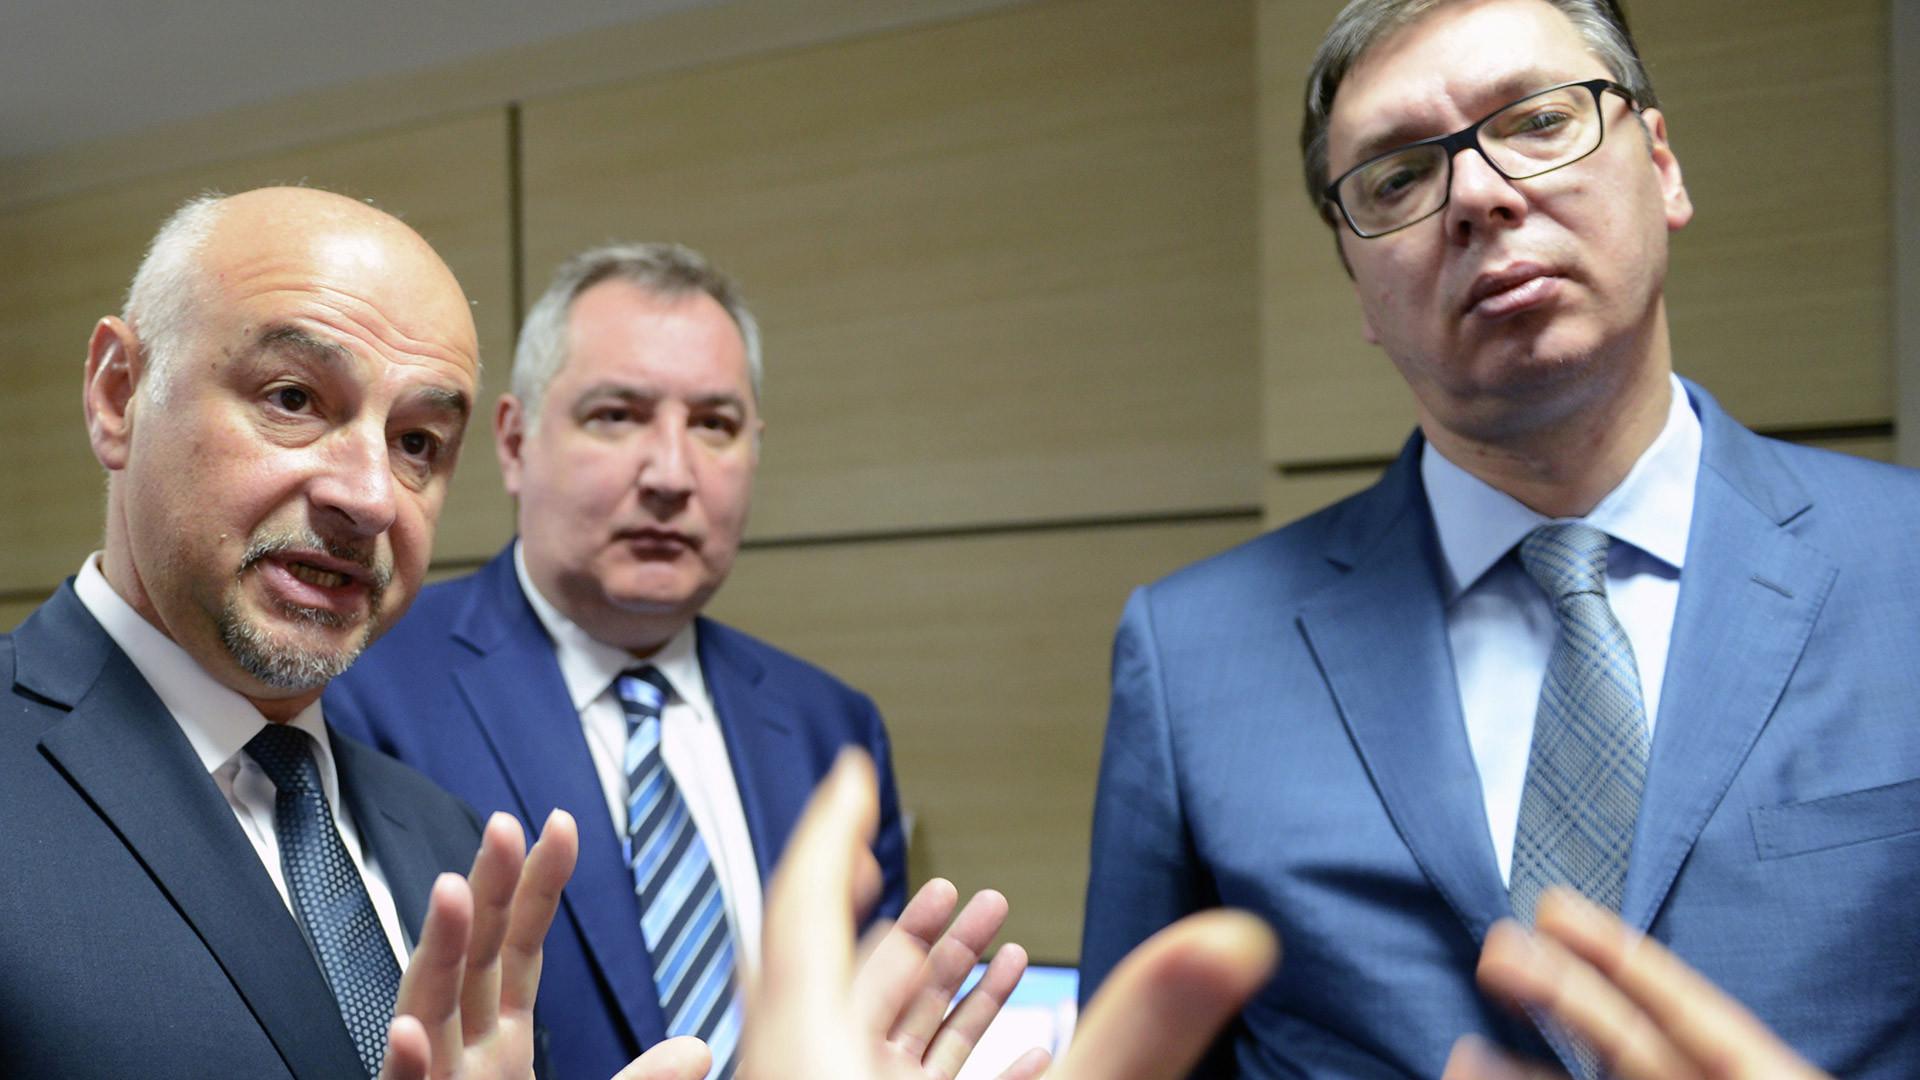 <p><span>Фото &copy; РИА Новости/Сергей Мамонтов</span></p>